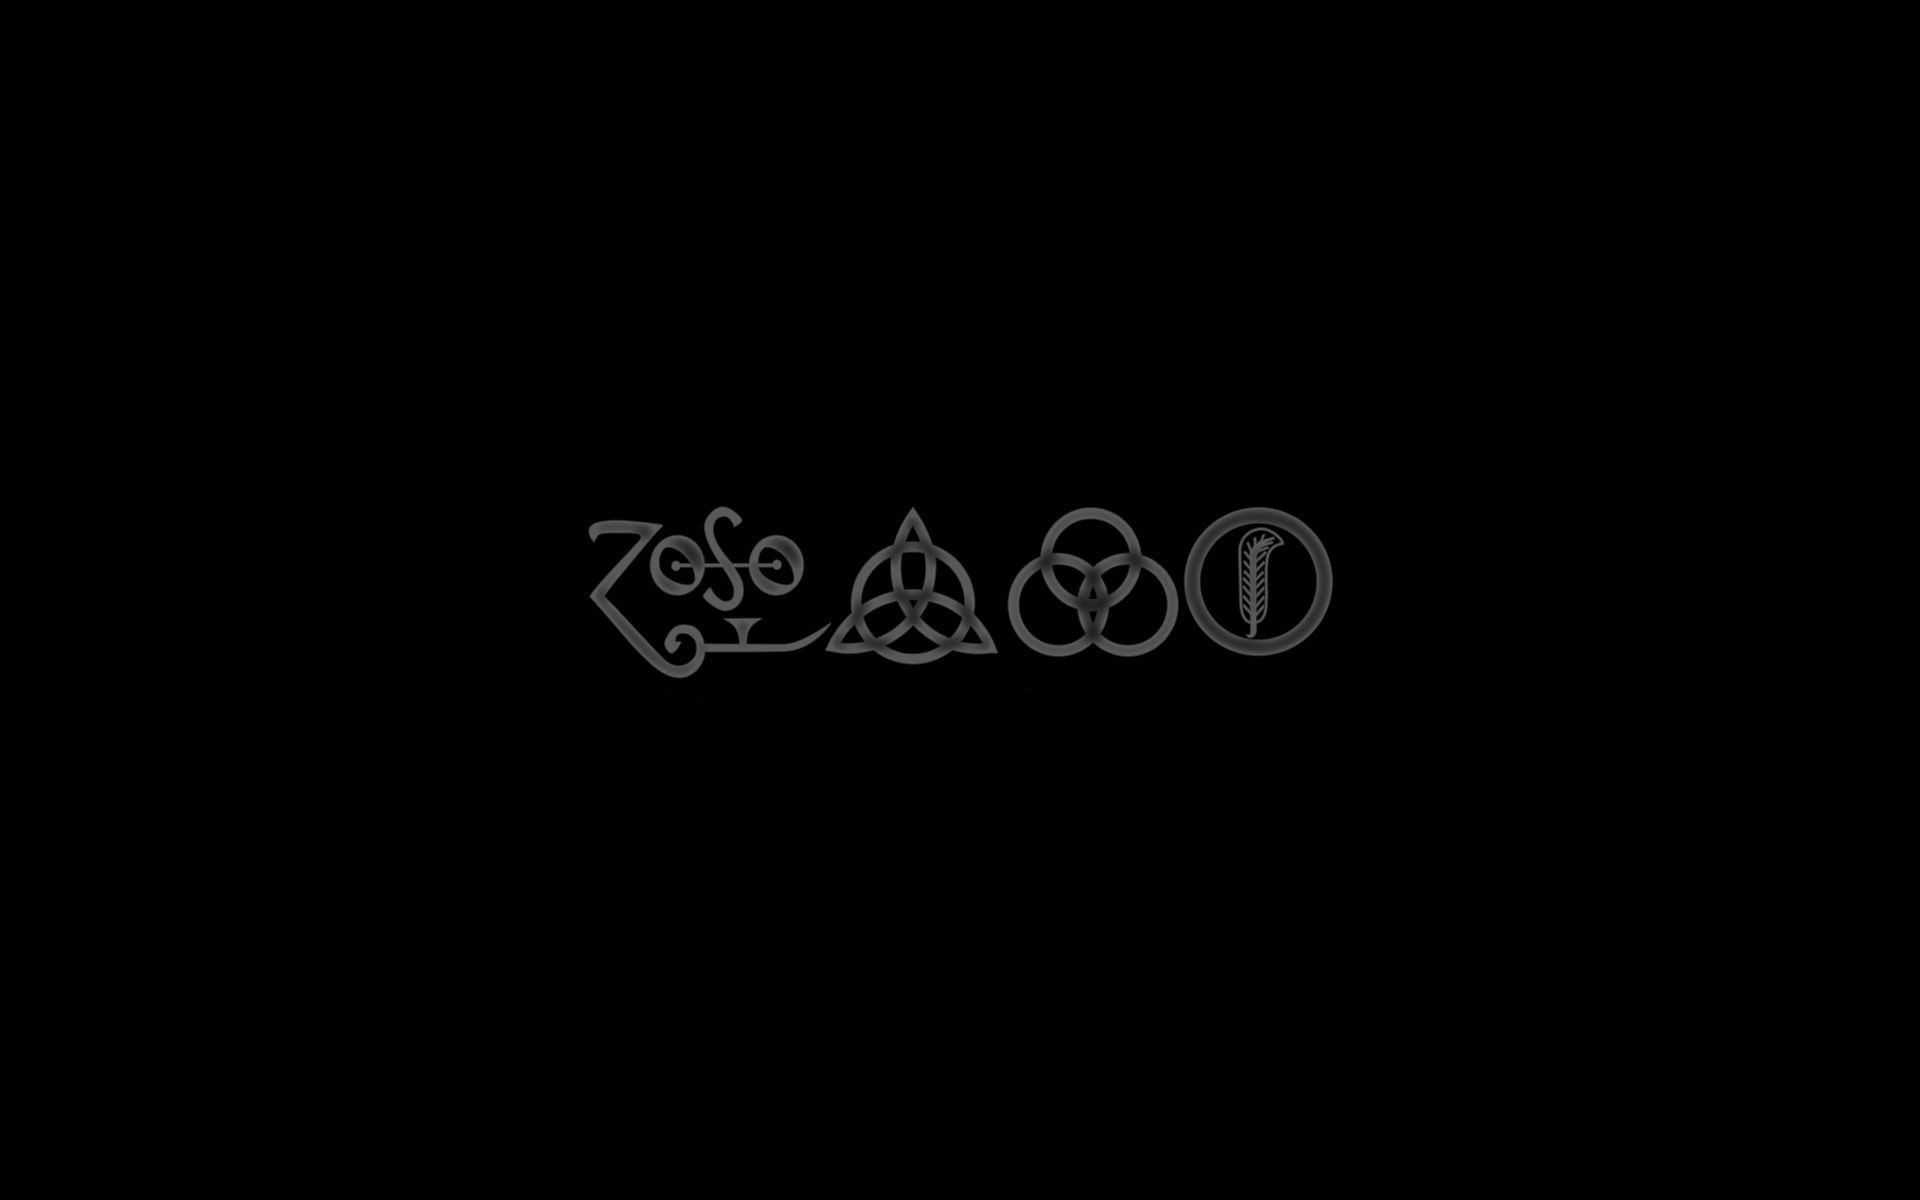 1920x1200 Led Zeppelin Desktop Pc And Mac Wallpaper Led Zeppelin Wallpaper Led Zeppelin Led Zeppelin Symbols